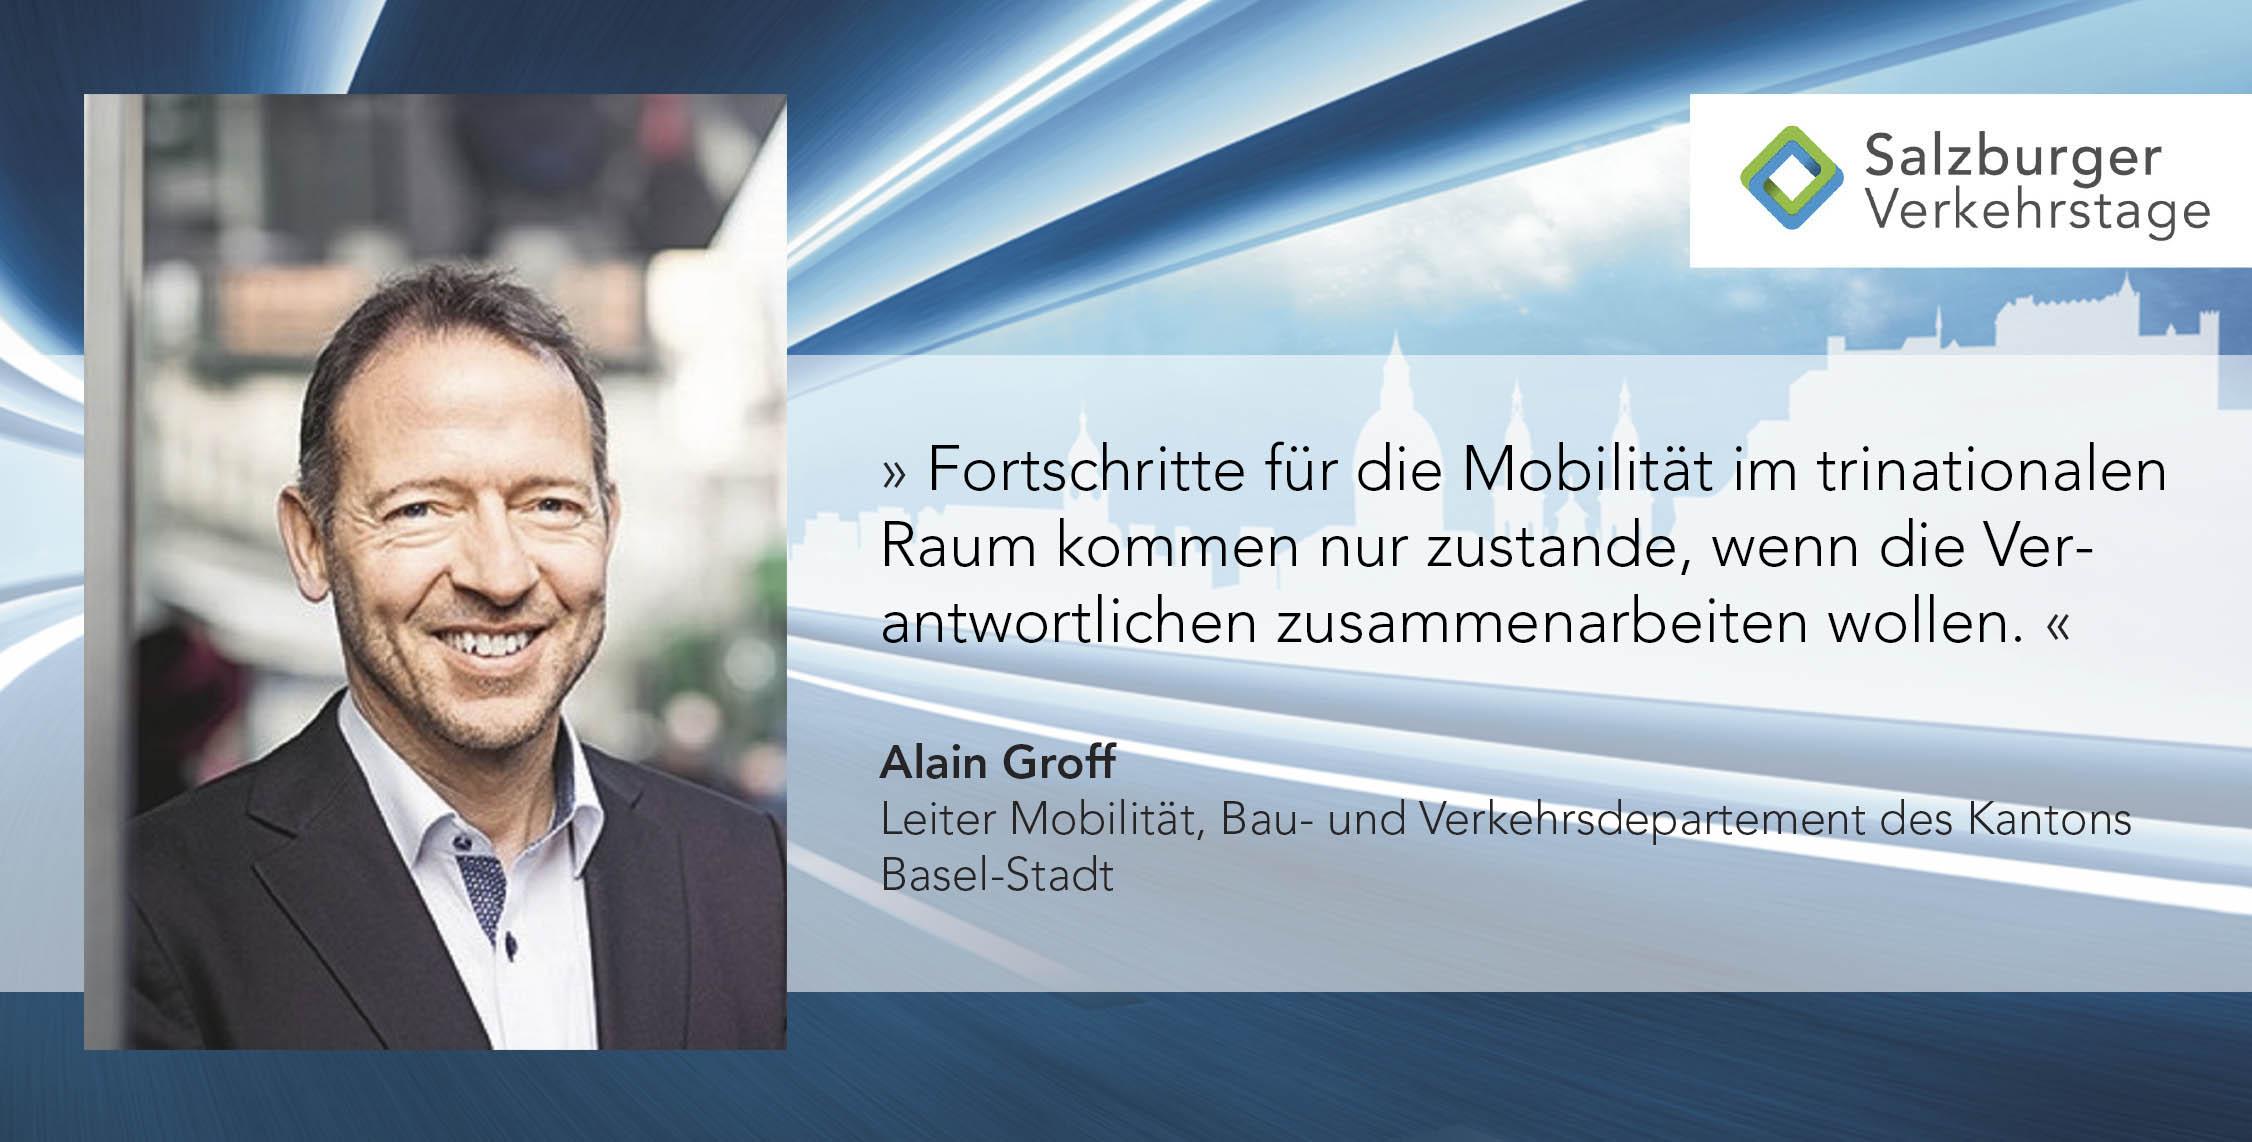 Microsoft Word - ABLAUF.docx